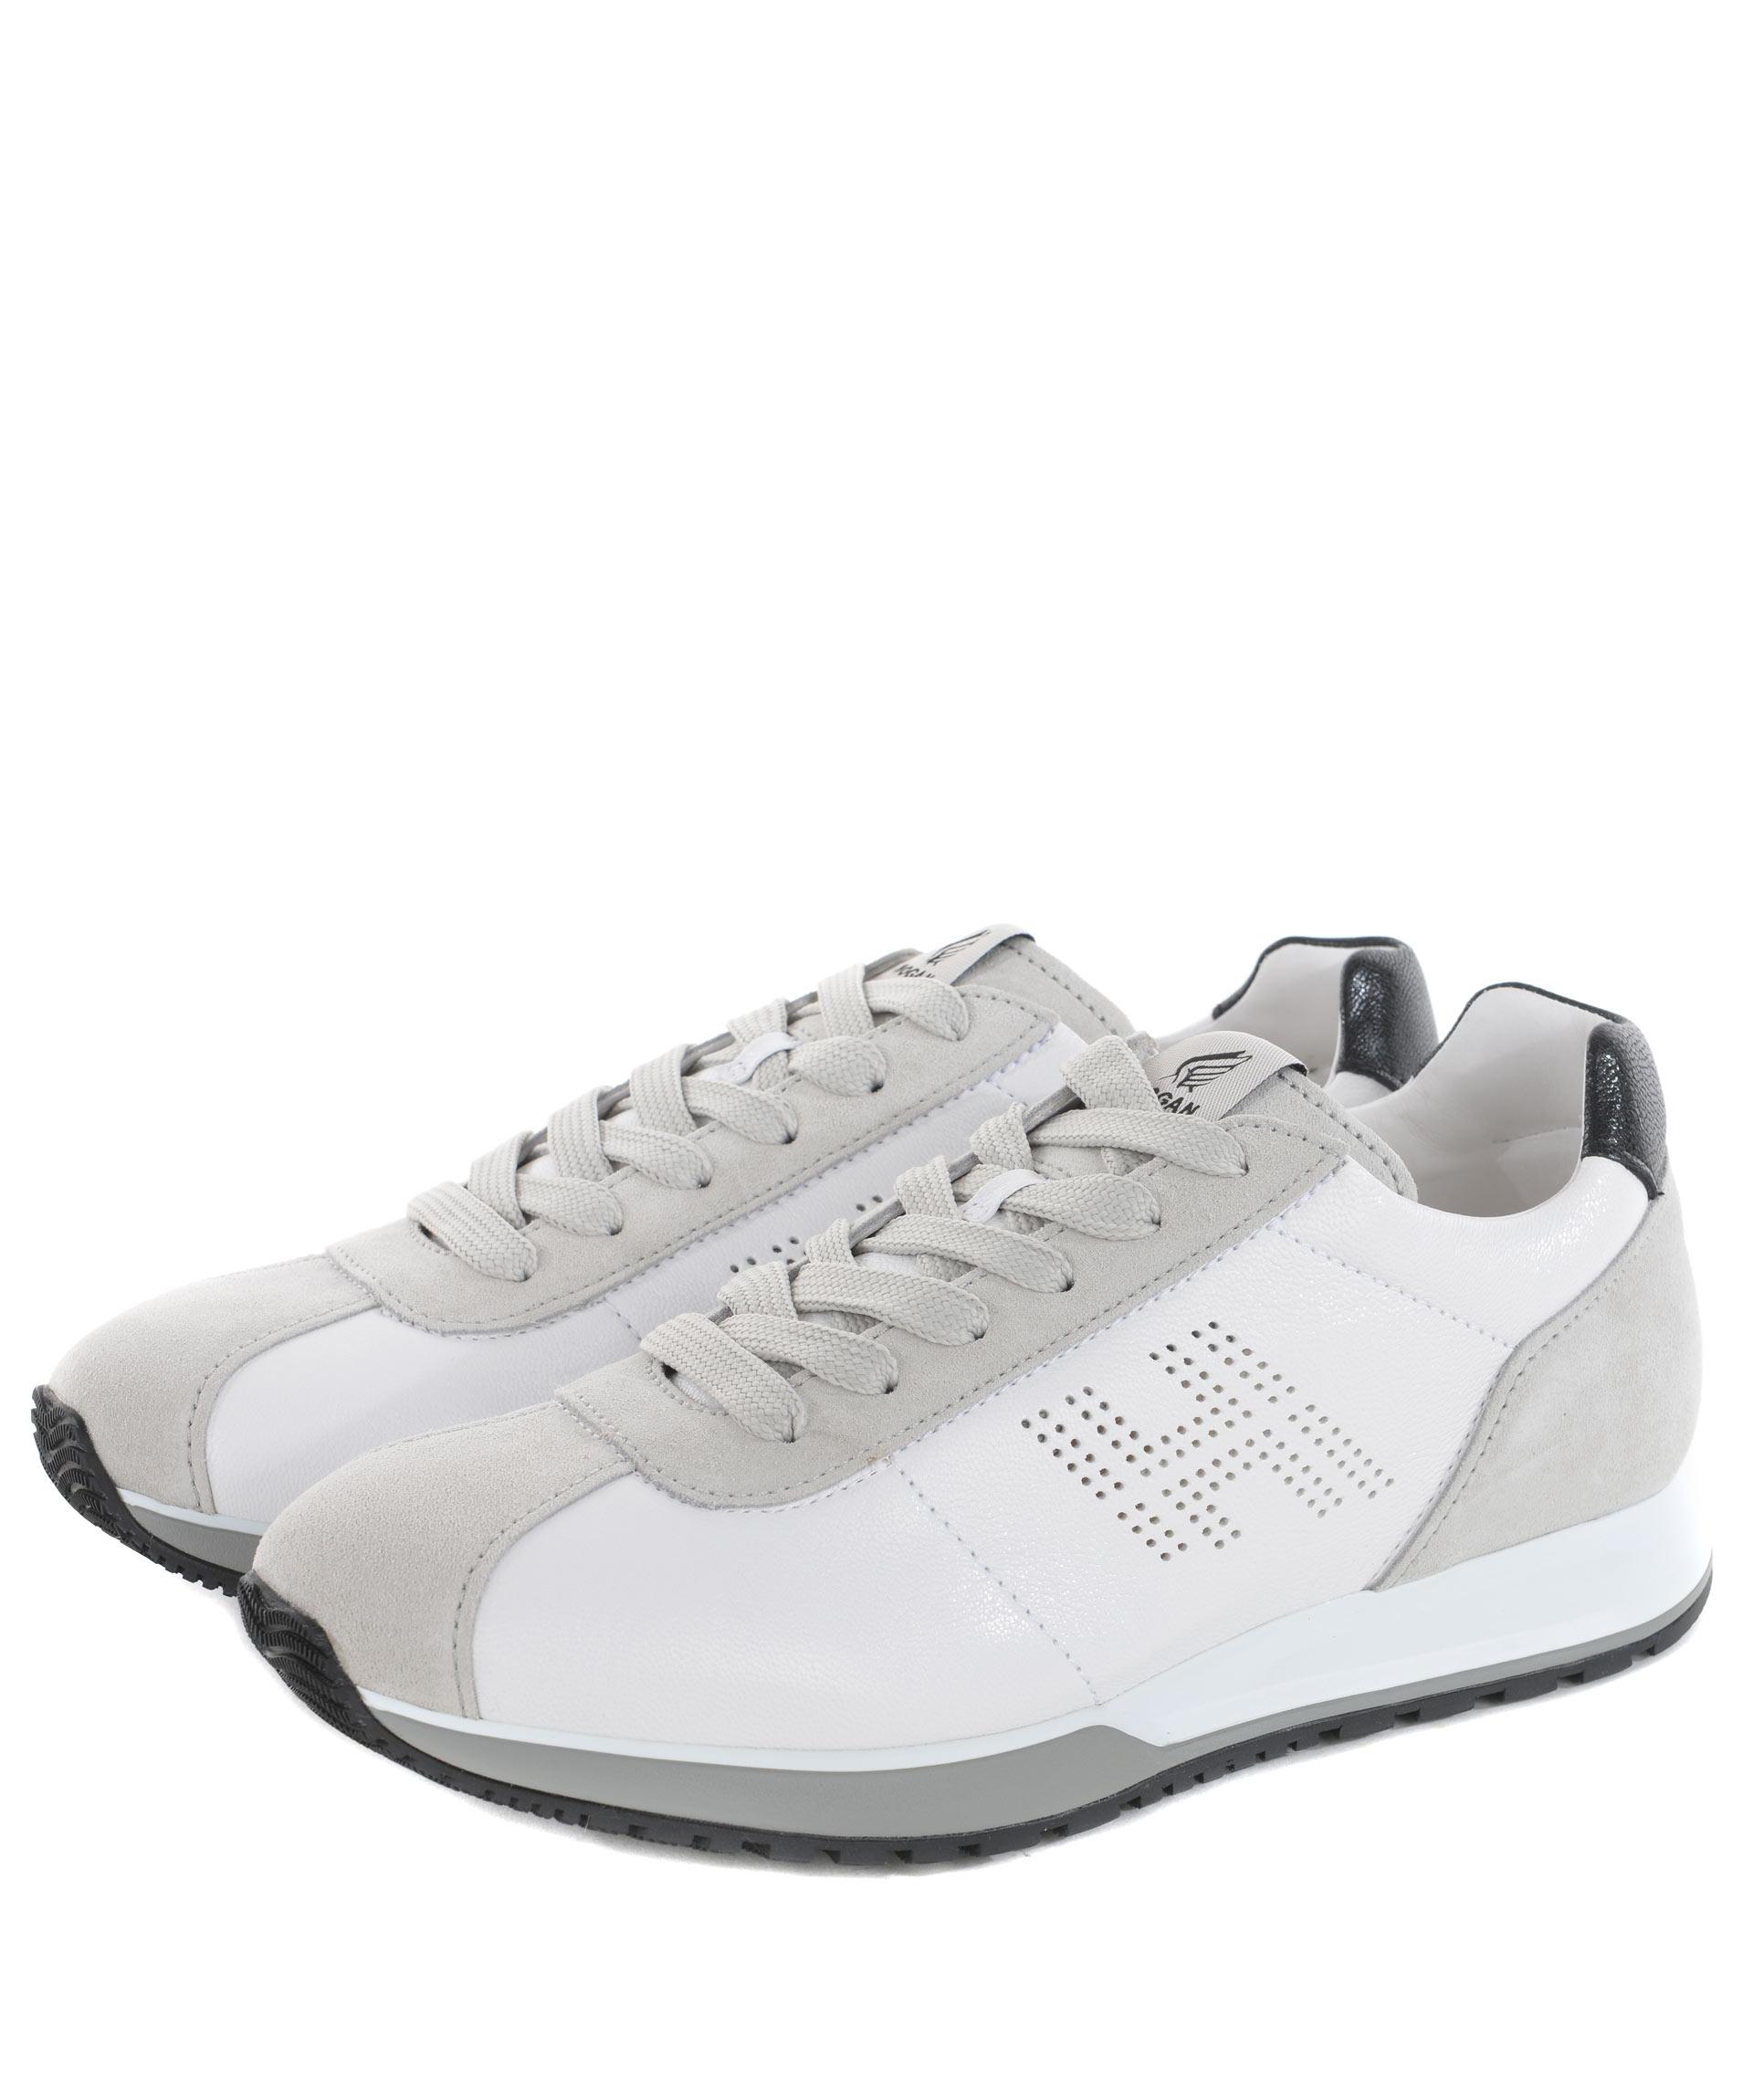 scarpe hogan uomo imitazioni